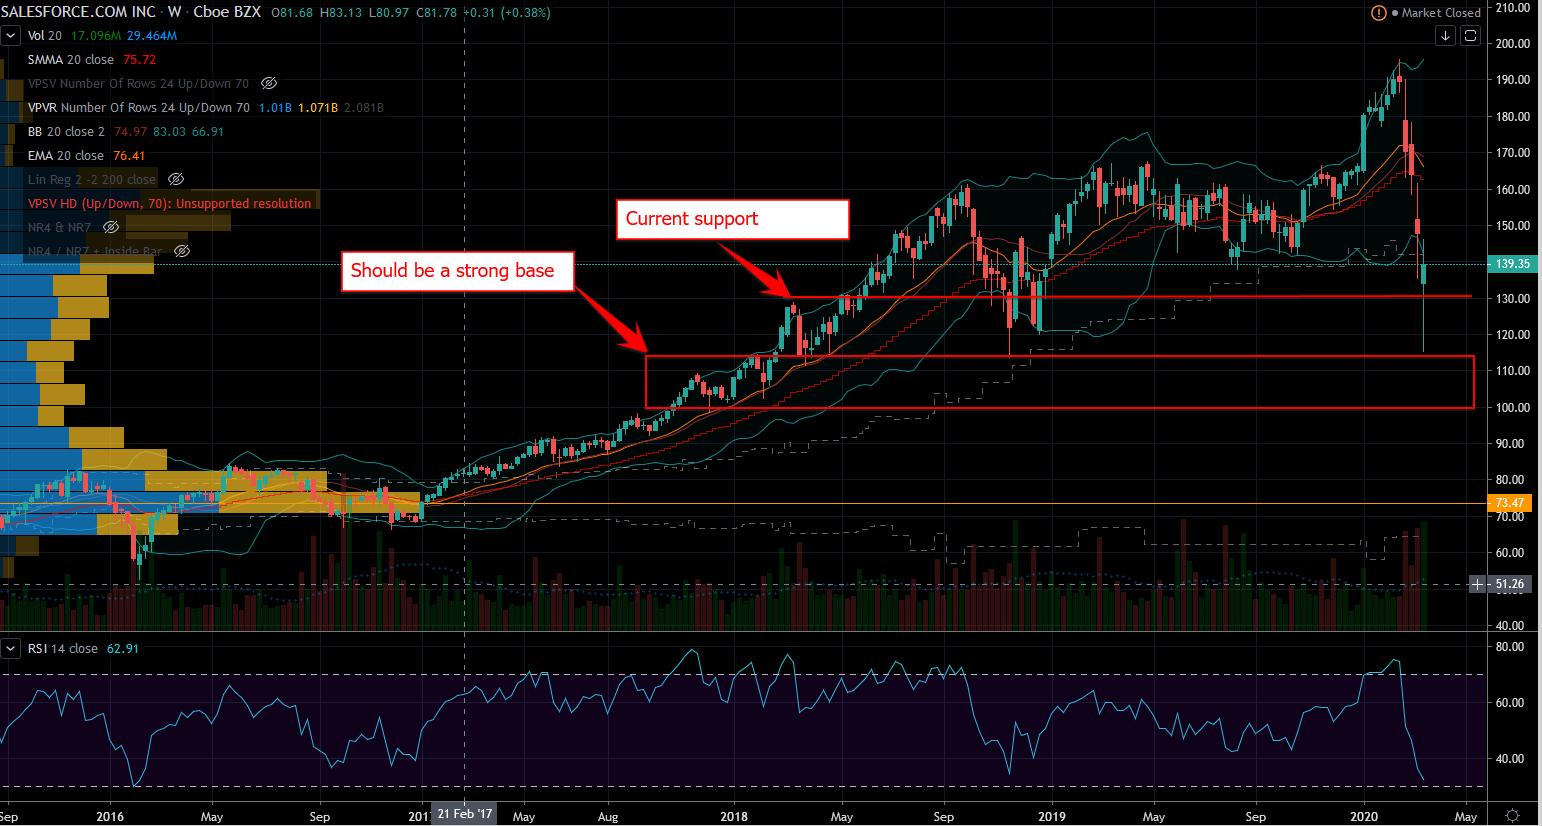 Saleforce.com Stock Chart